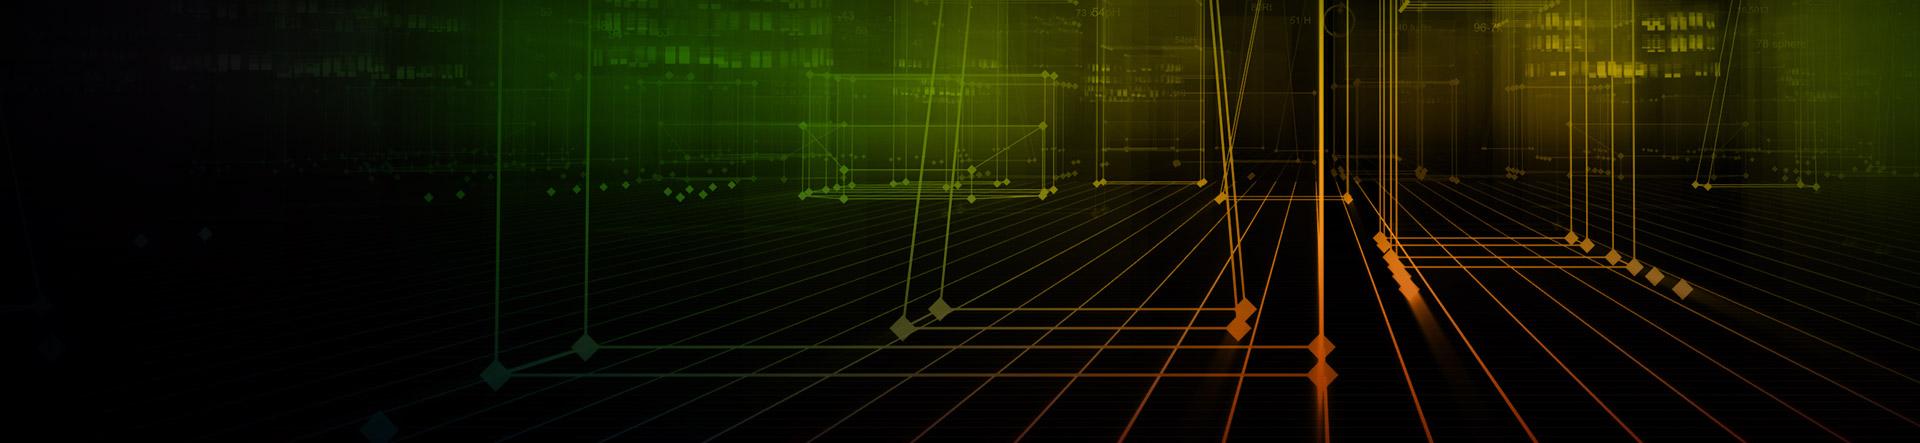 virtual gridded line connection banner